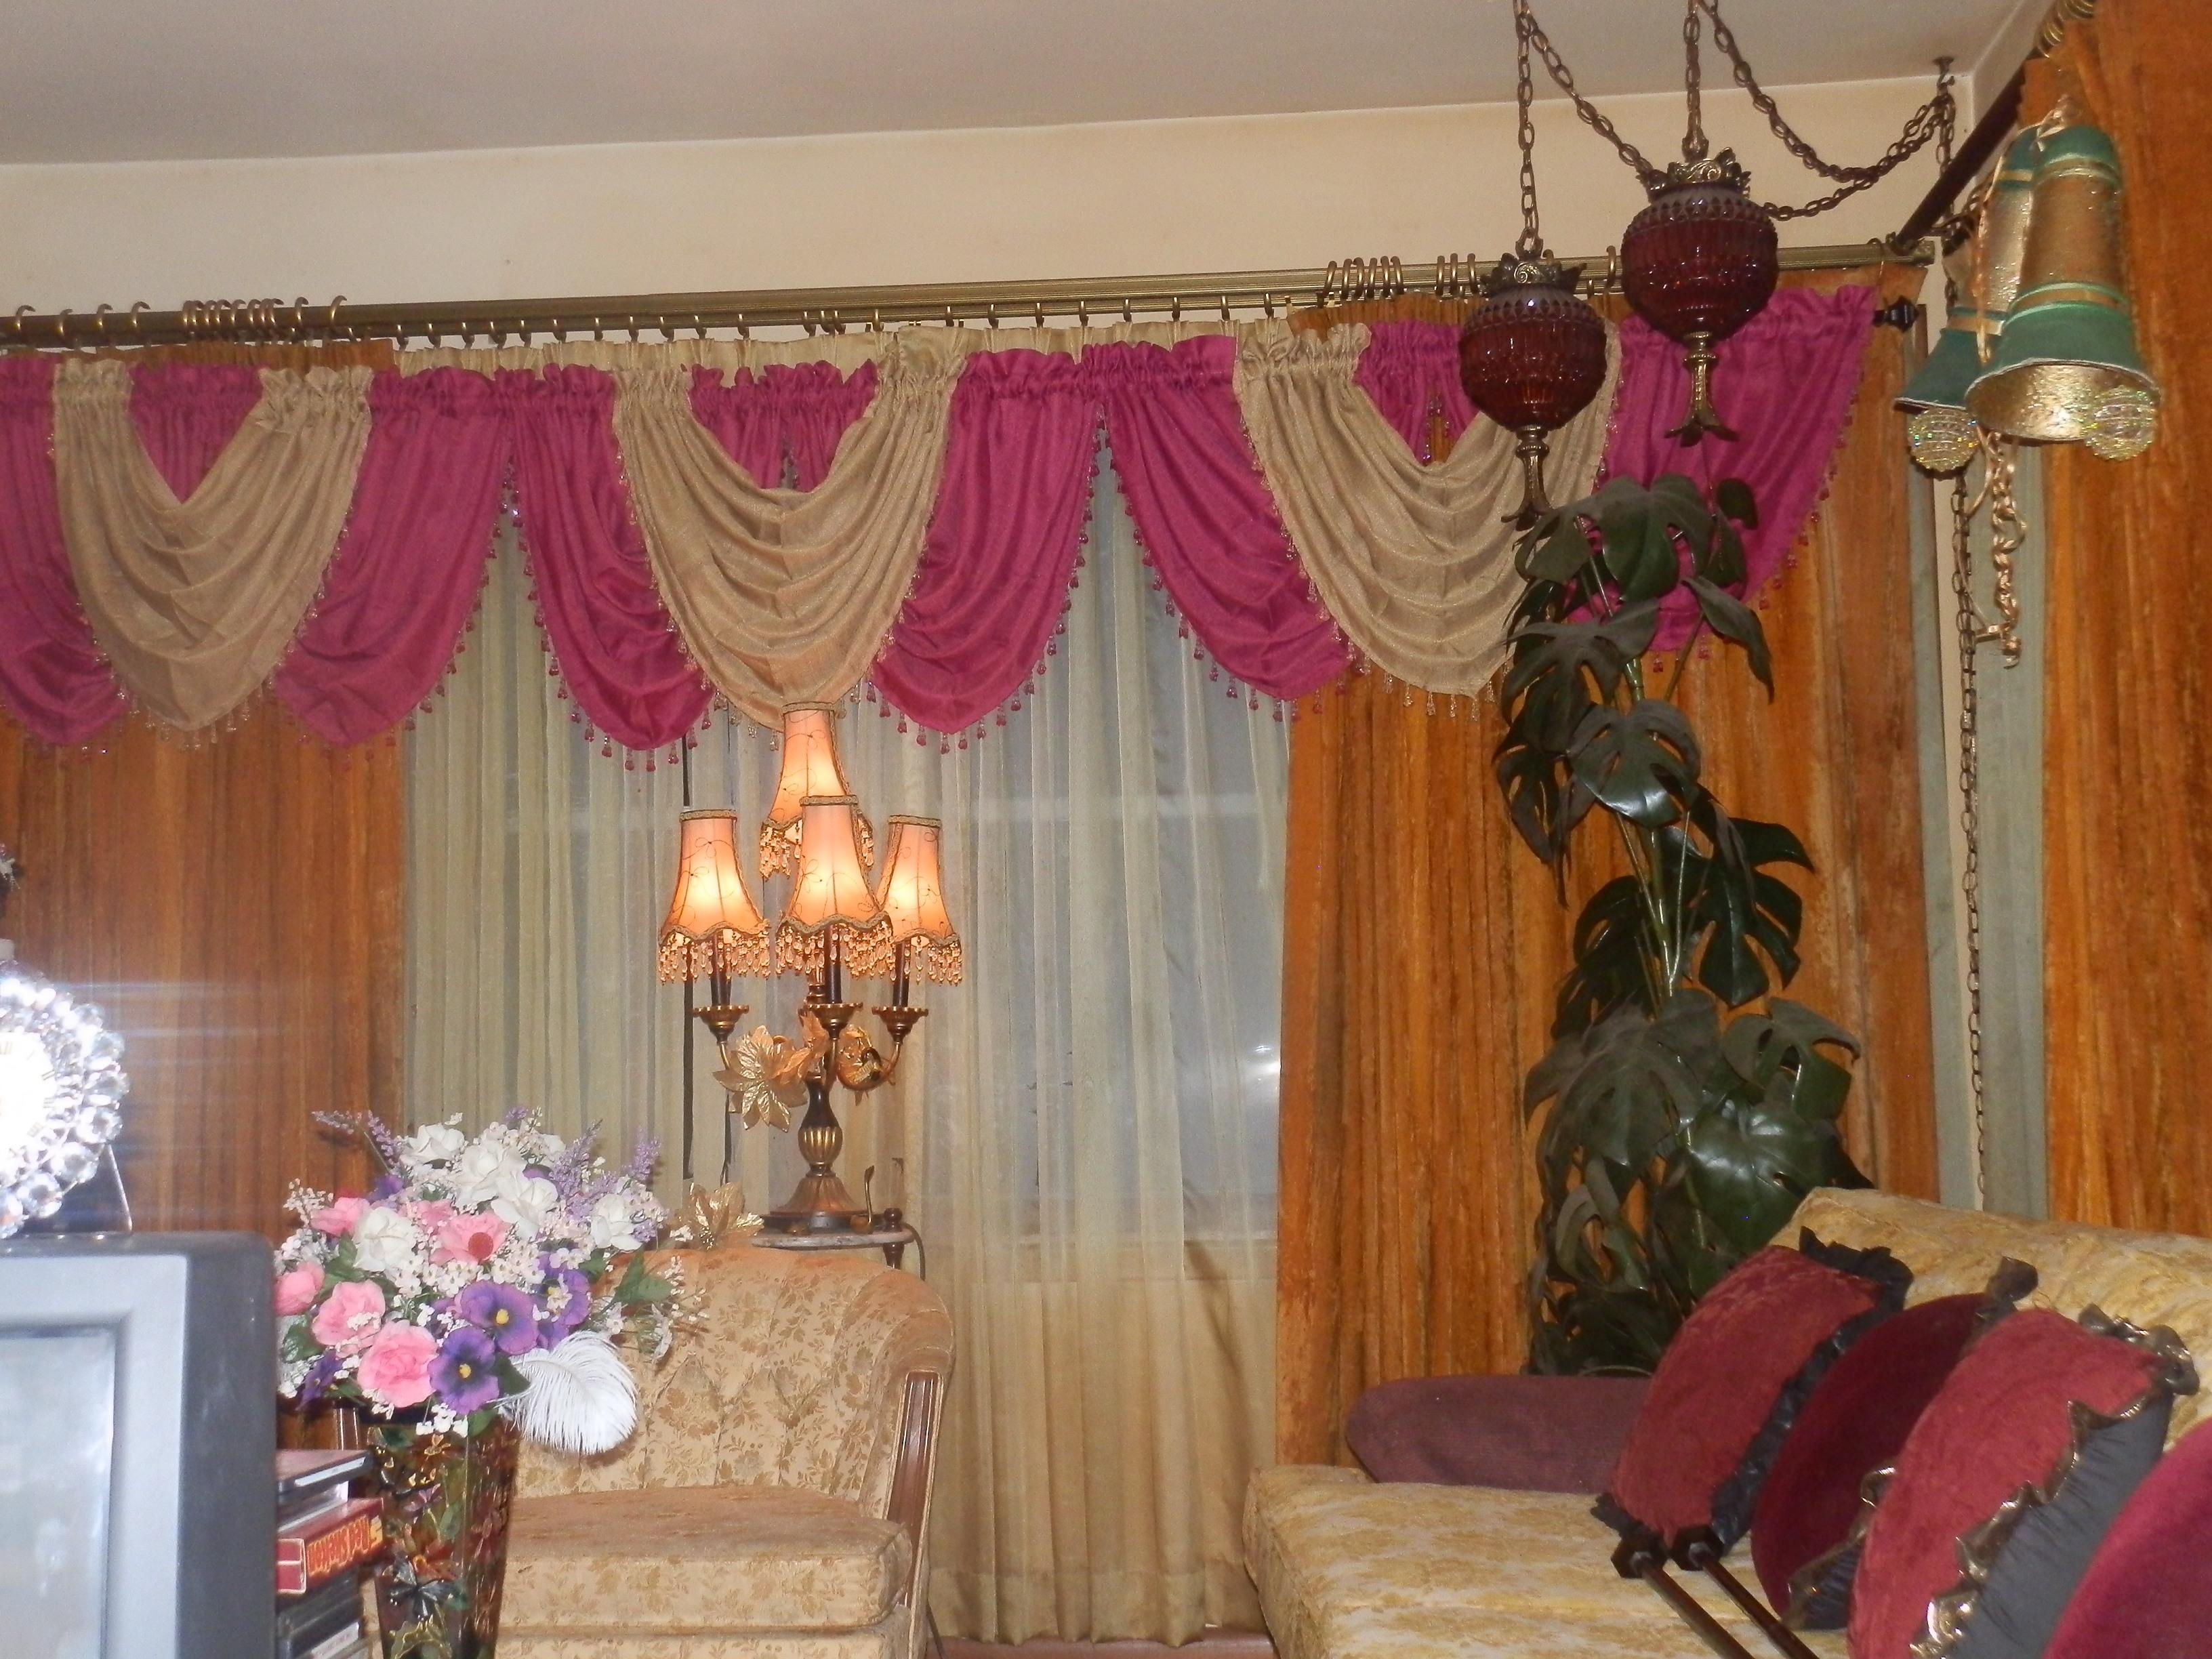 elegante valance p valances light window gold expand click to decorative tuck treatment sequined x